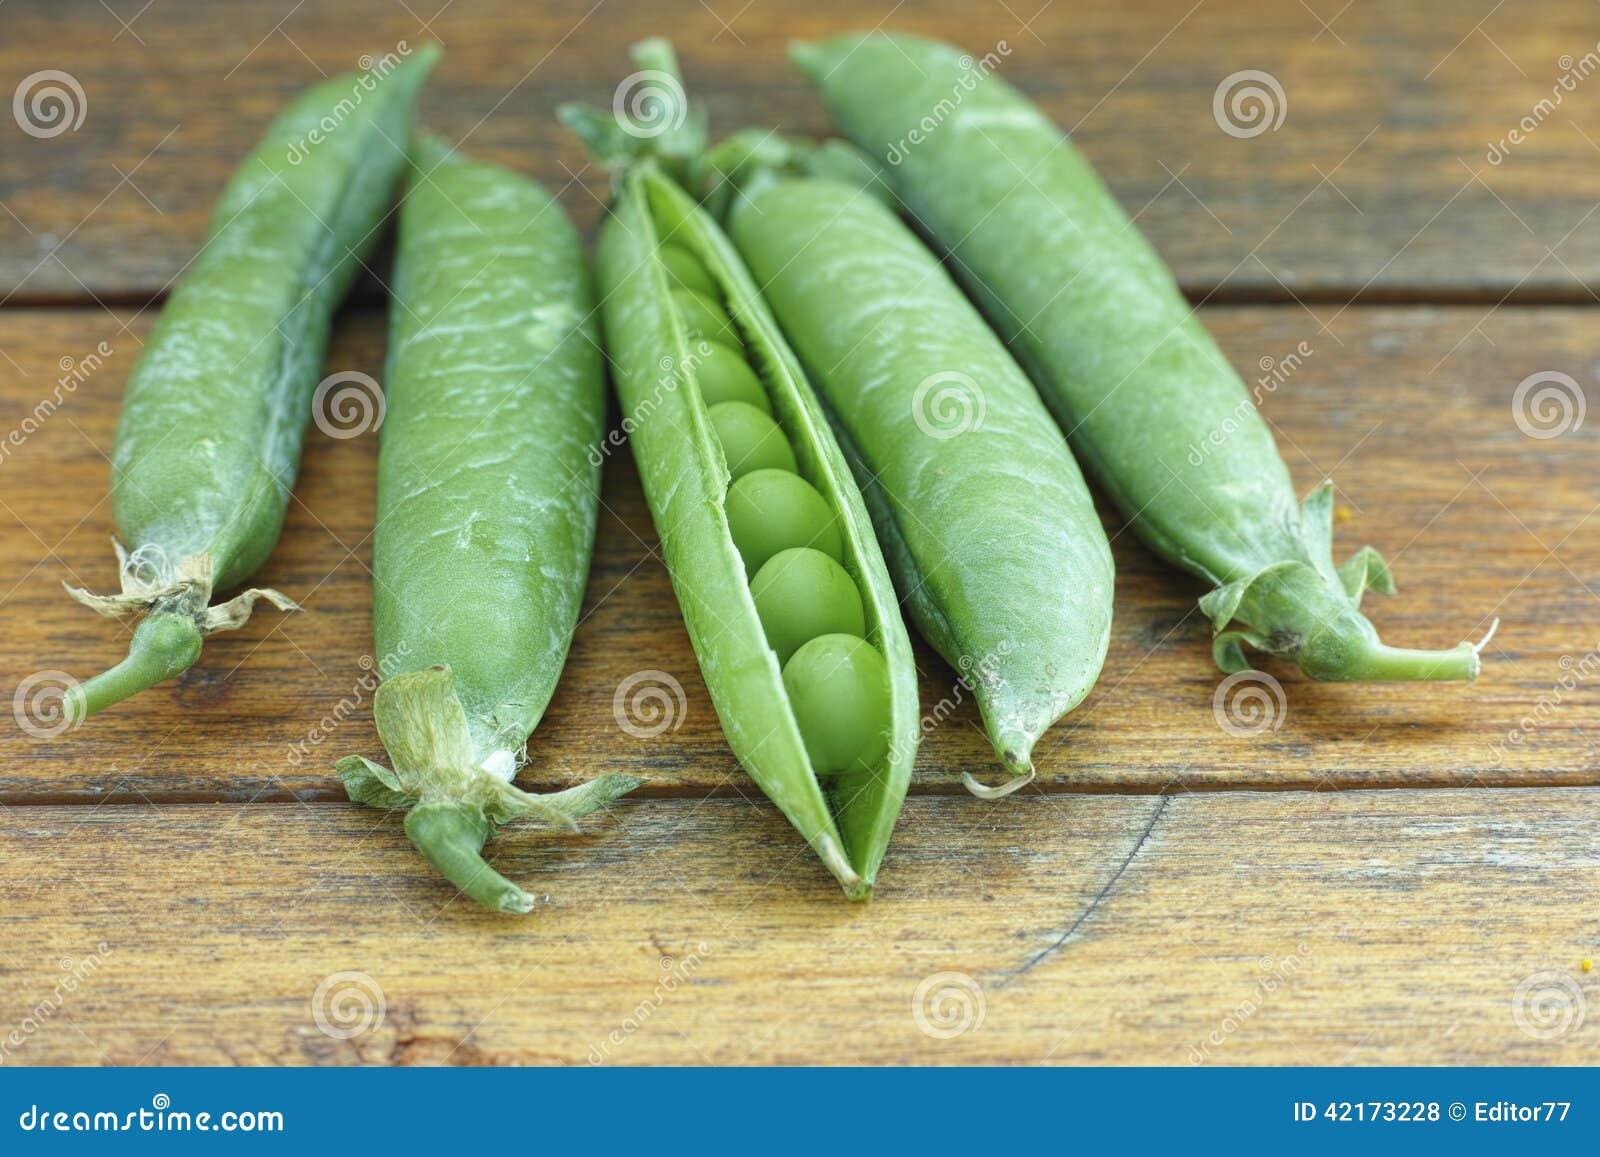 Fresh pea pods